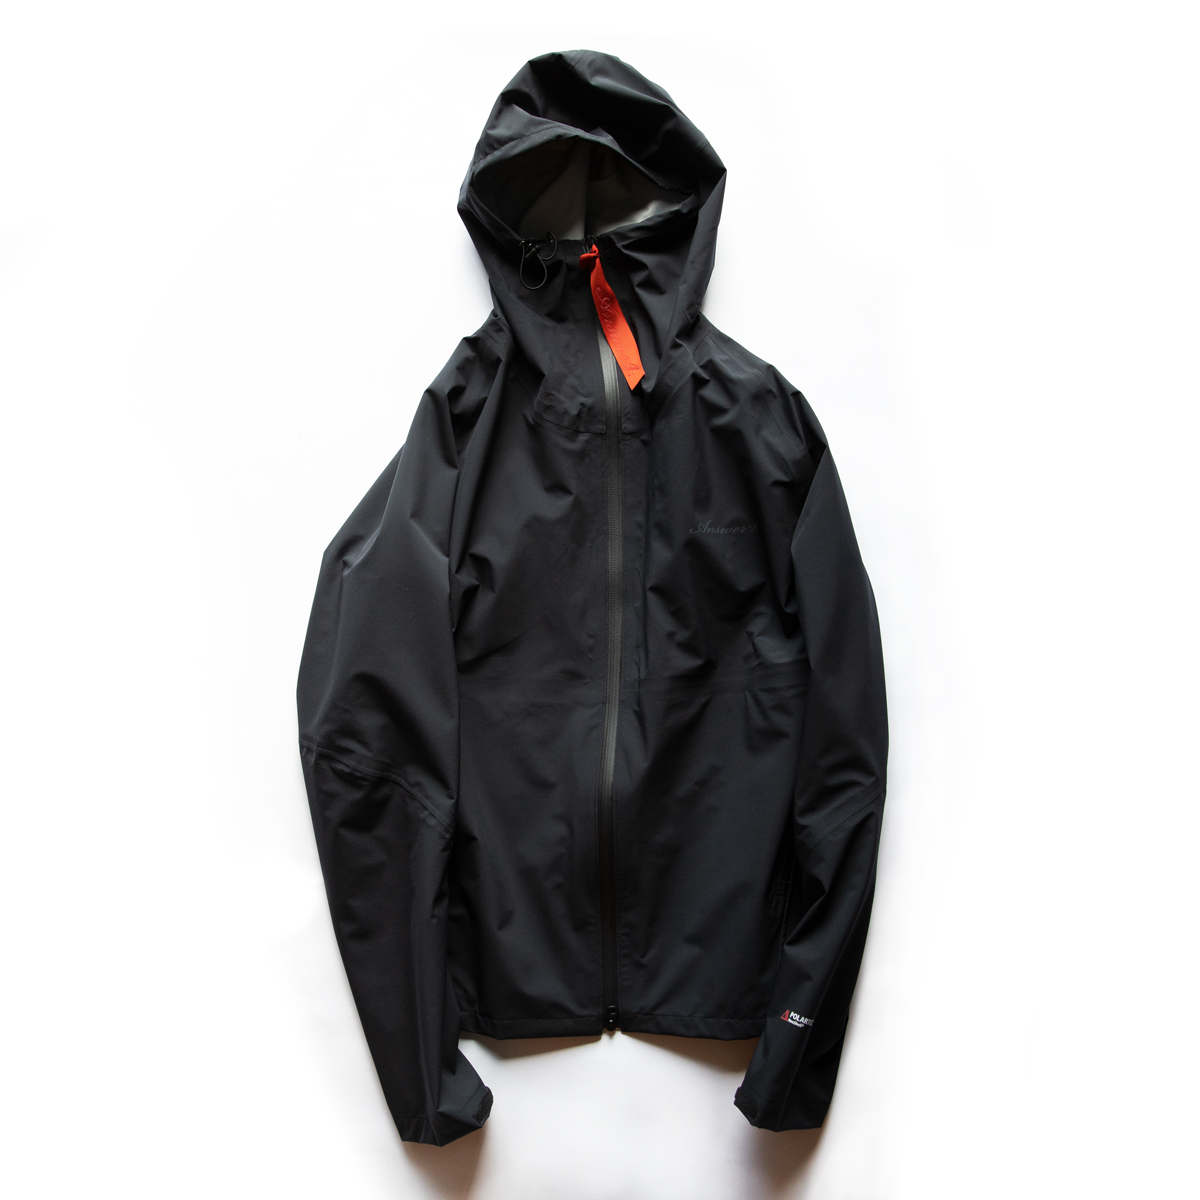 NeoShell Jacket S_2